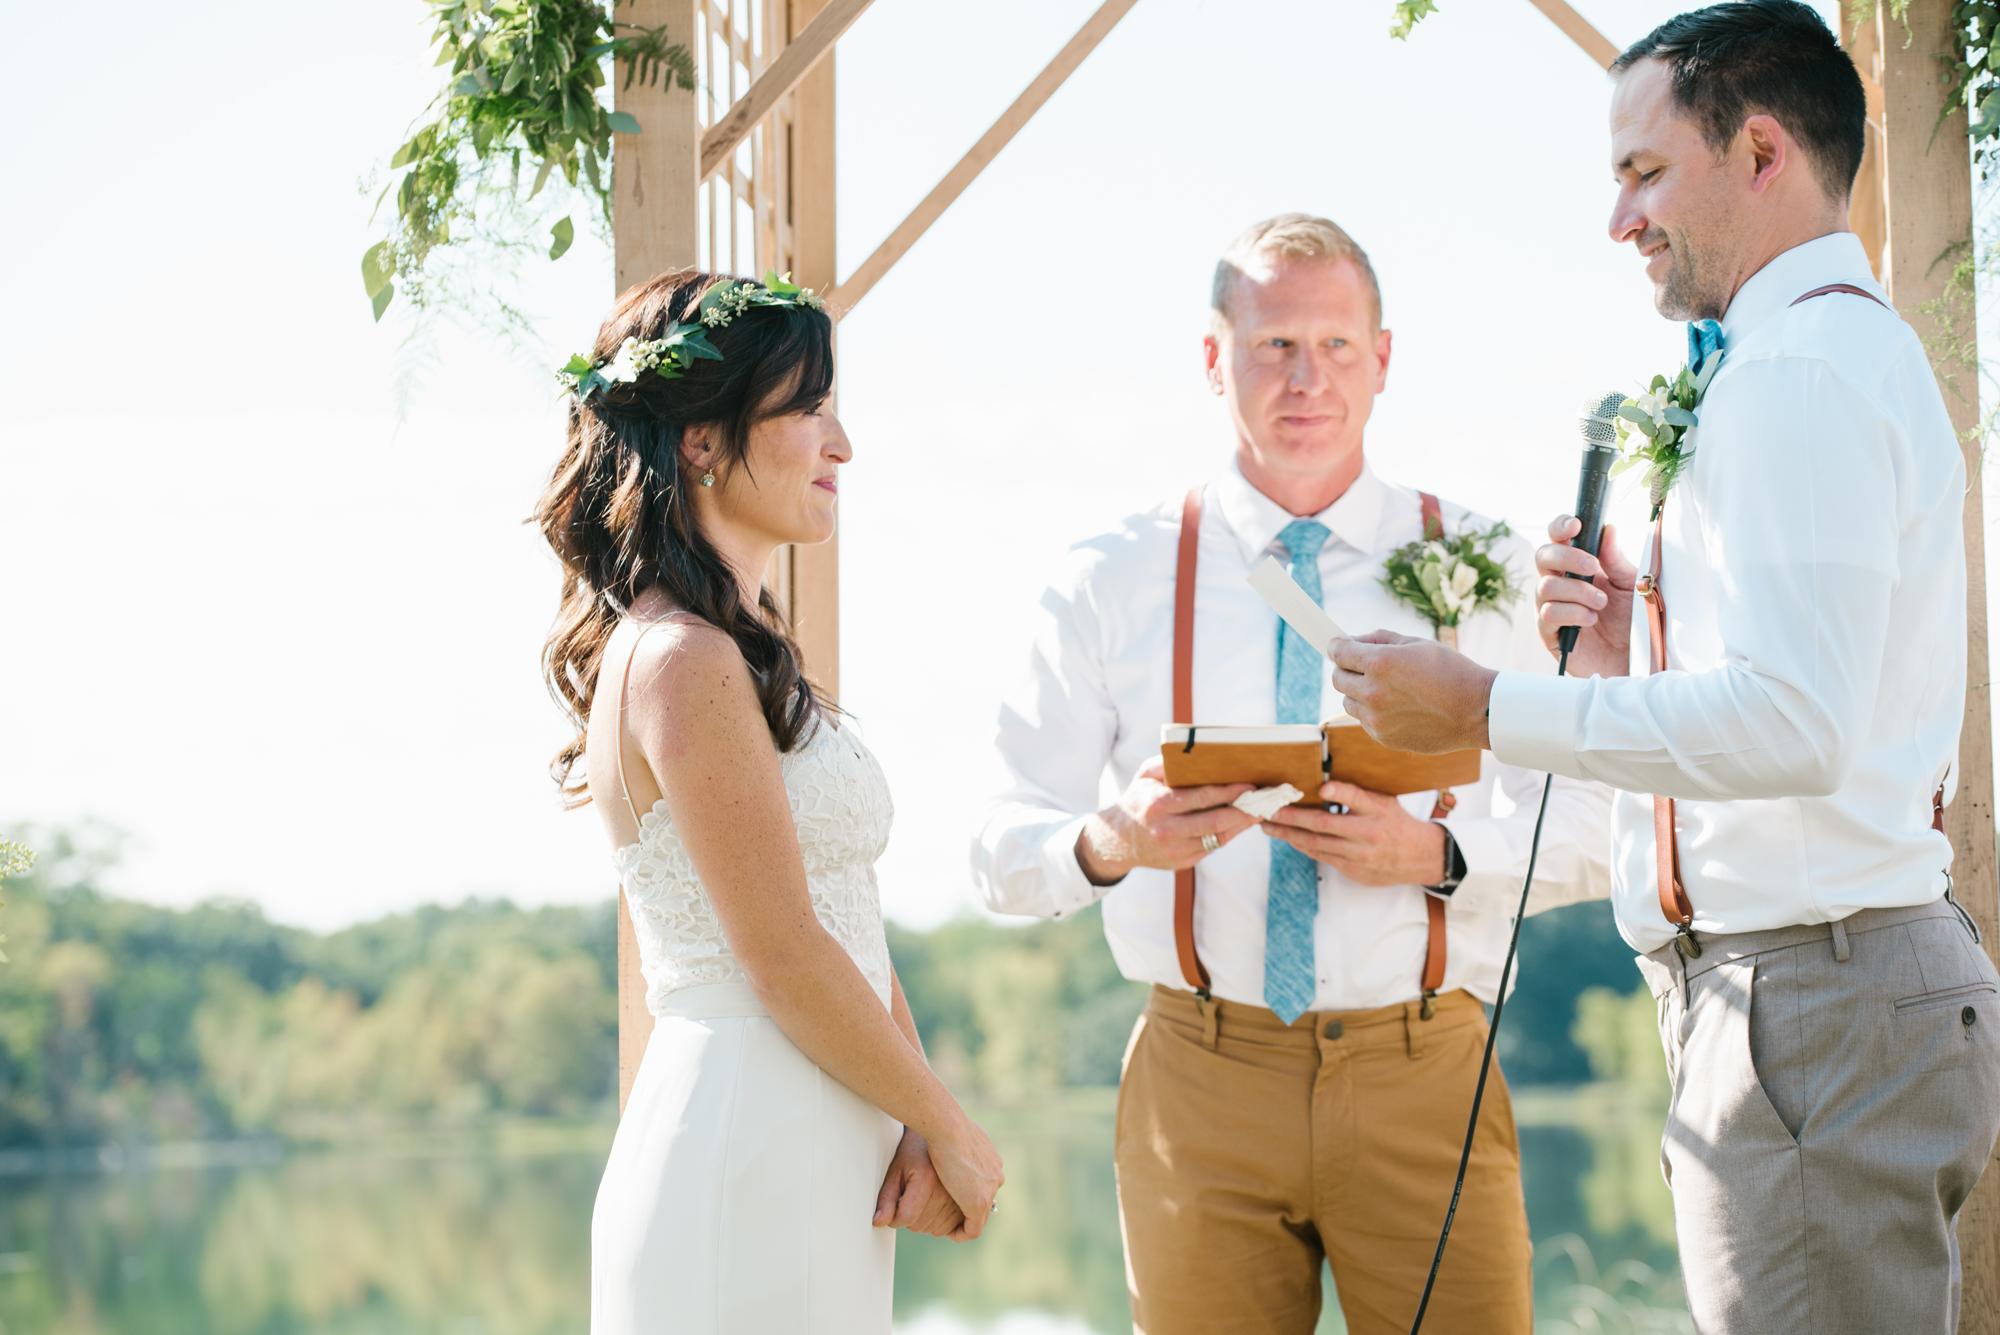 Quincy-Coldwater-Michigan-farm-wedding-photogapher-sydney-marie (163).jpg